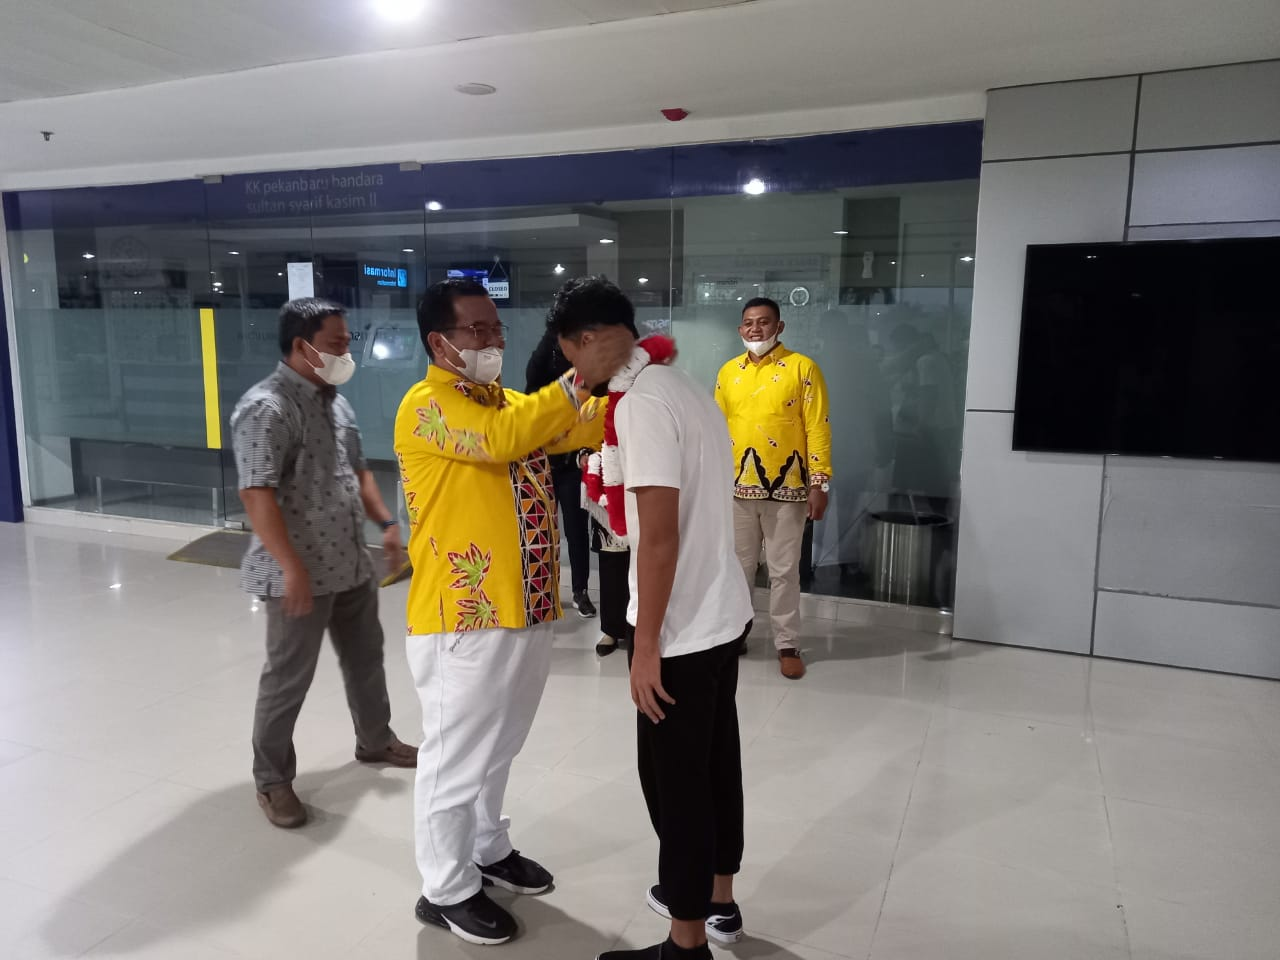 Kasek SMAN 1 Telukkuantan Jemput M Ricky Langsung ke Bandara